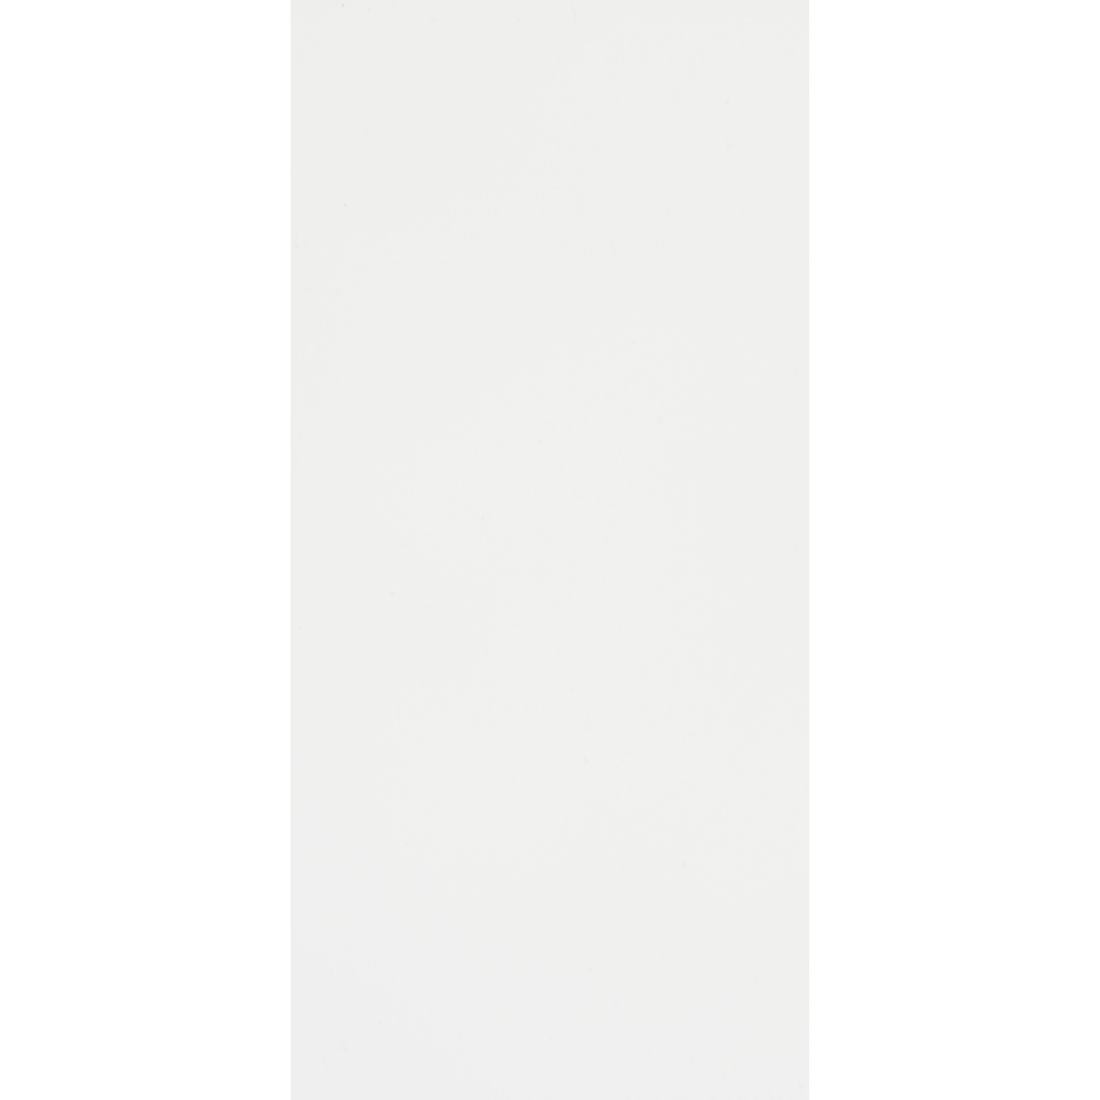 Aqua Wall Lining Panel Polar White Matte 2400 x 1200 x 4.5mm